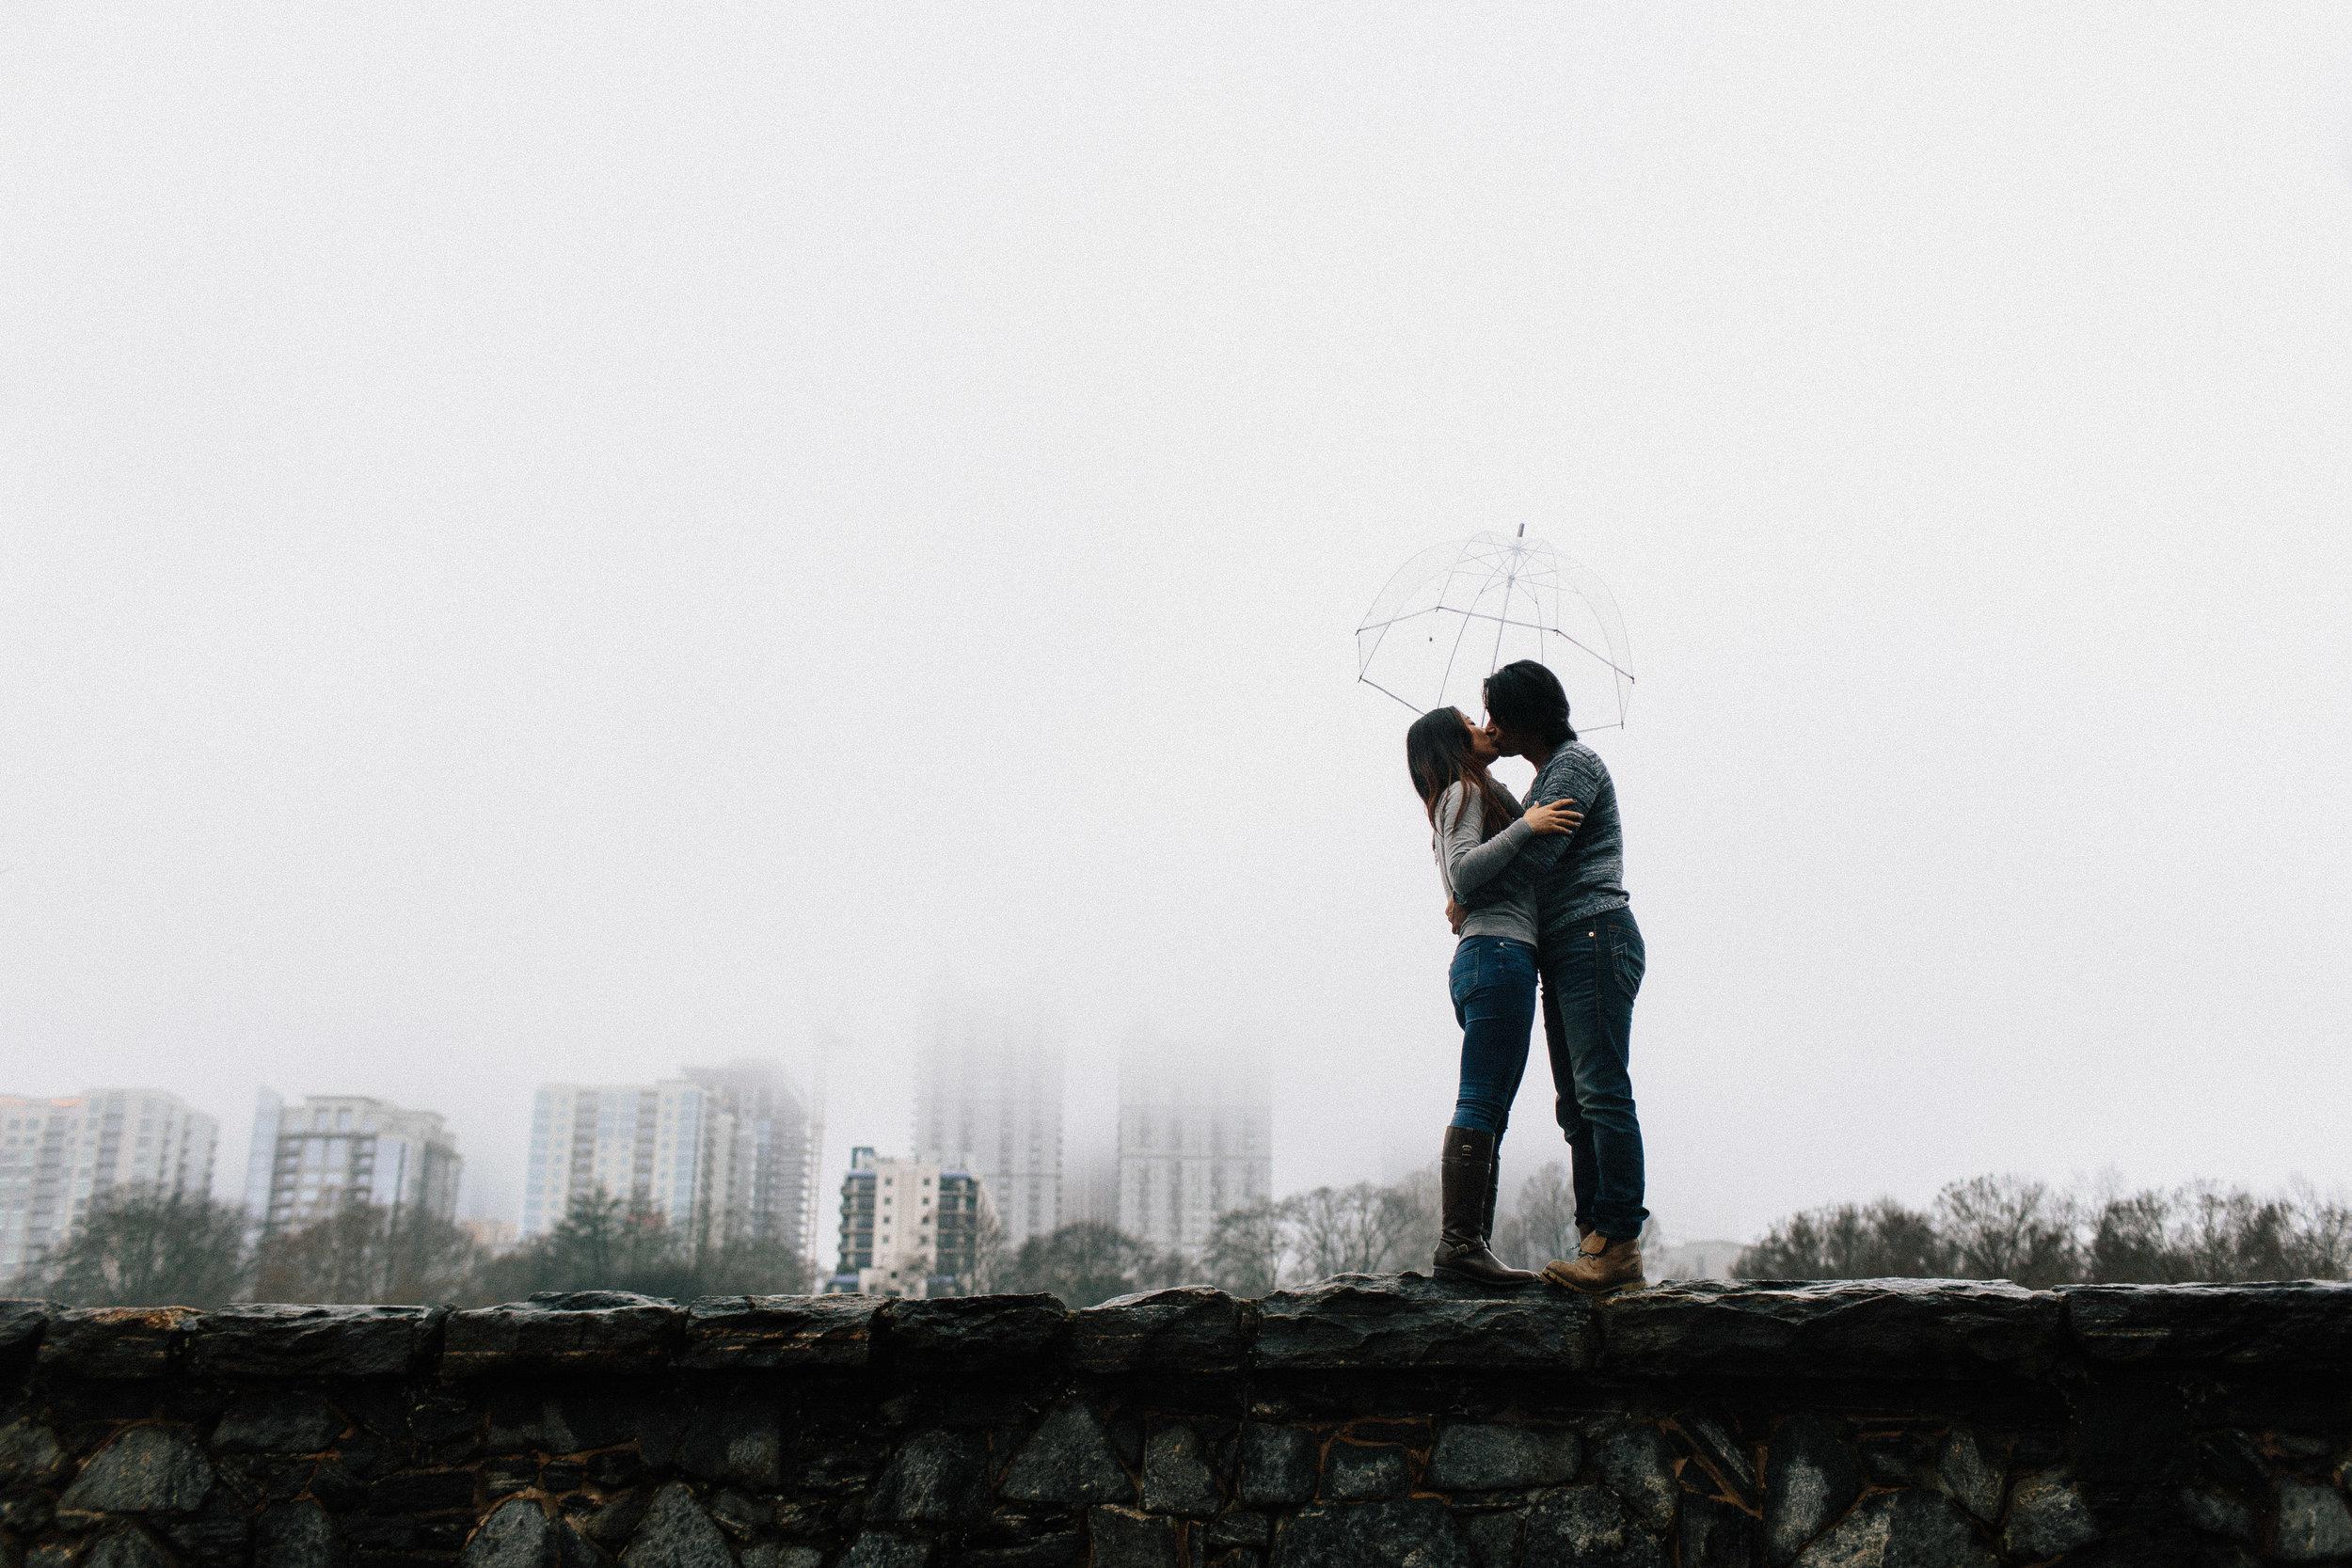 atlanta_gloomy_day_rainy_engagement_couple_lifestyle_fun_playful_artistic_georgia_photographer_2097.jpg